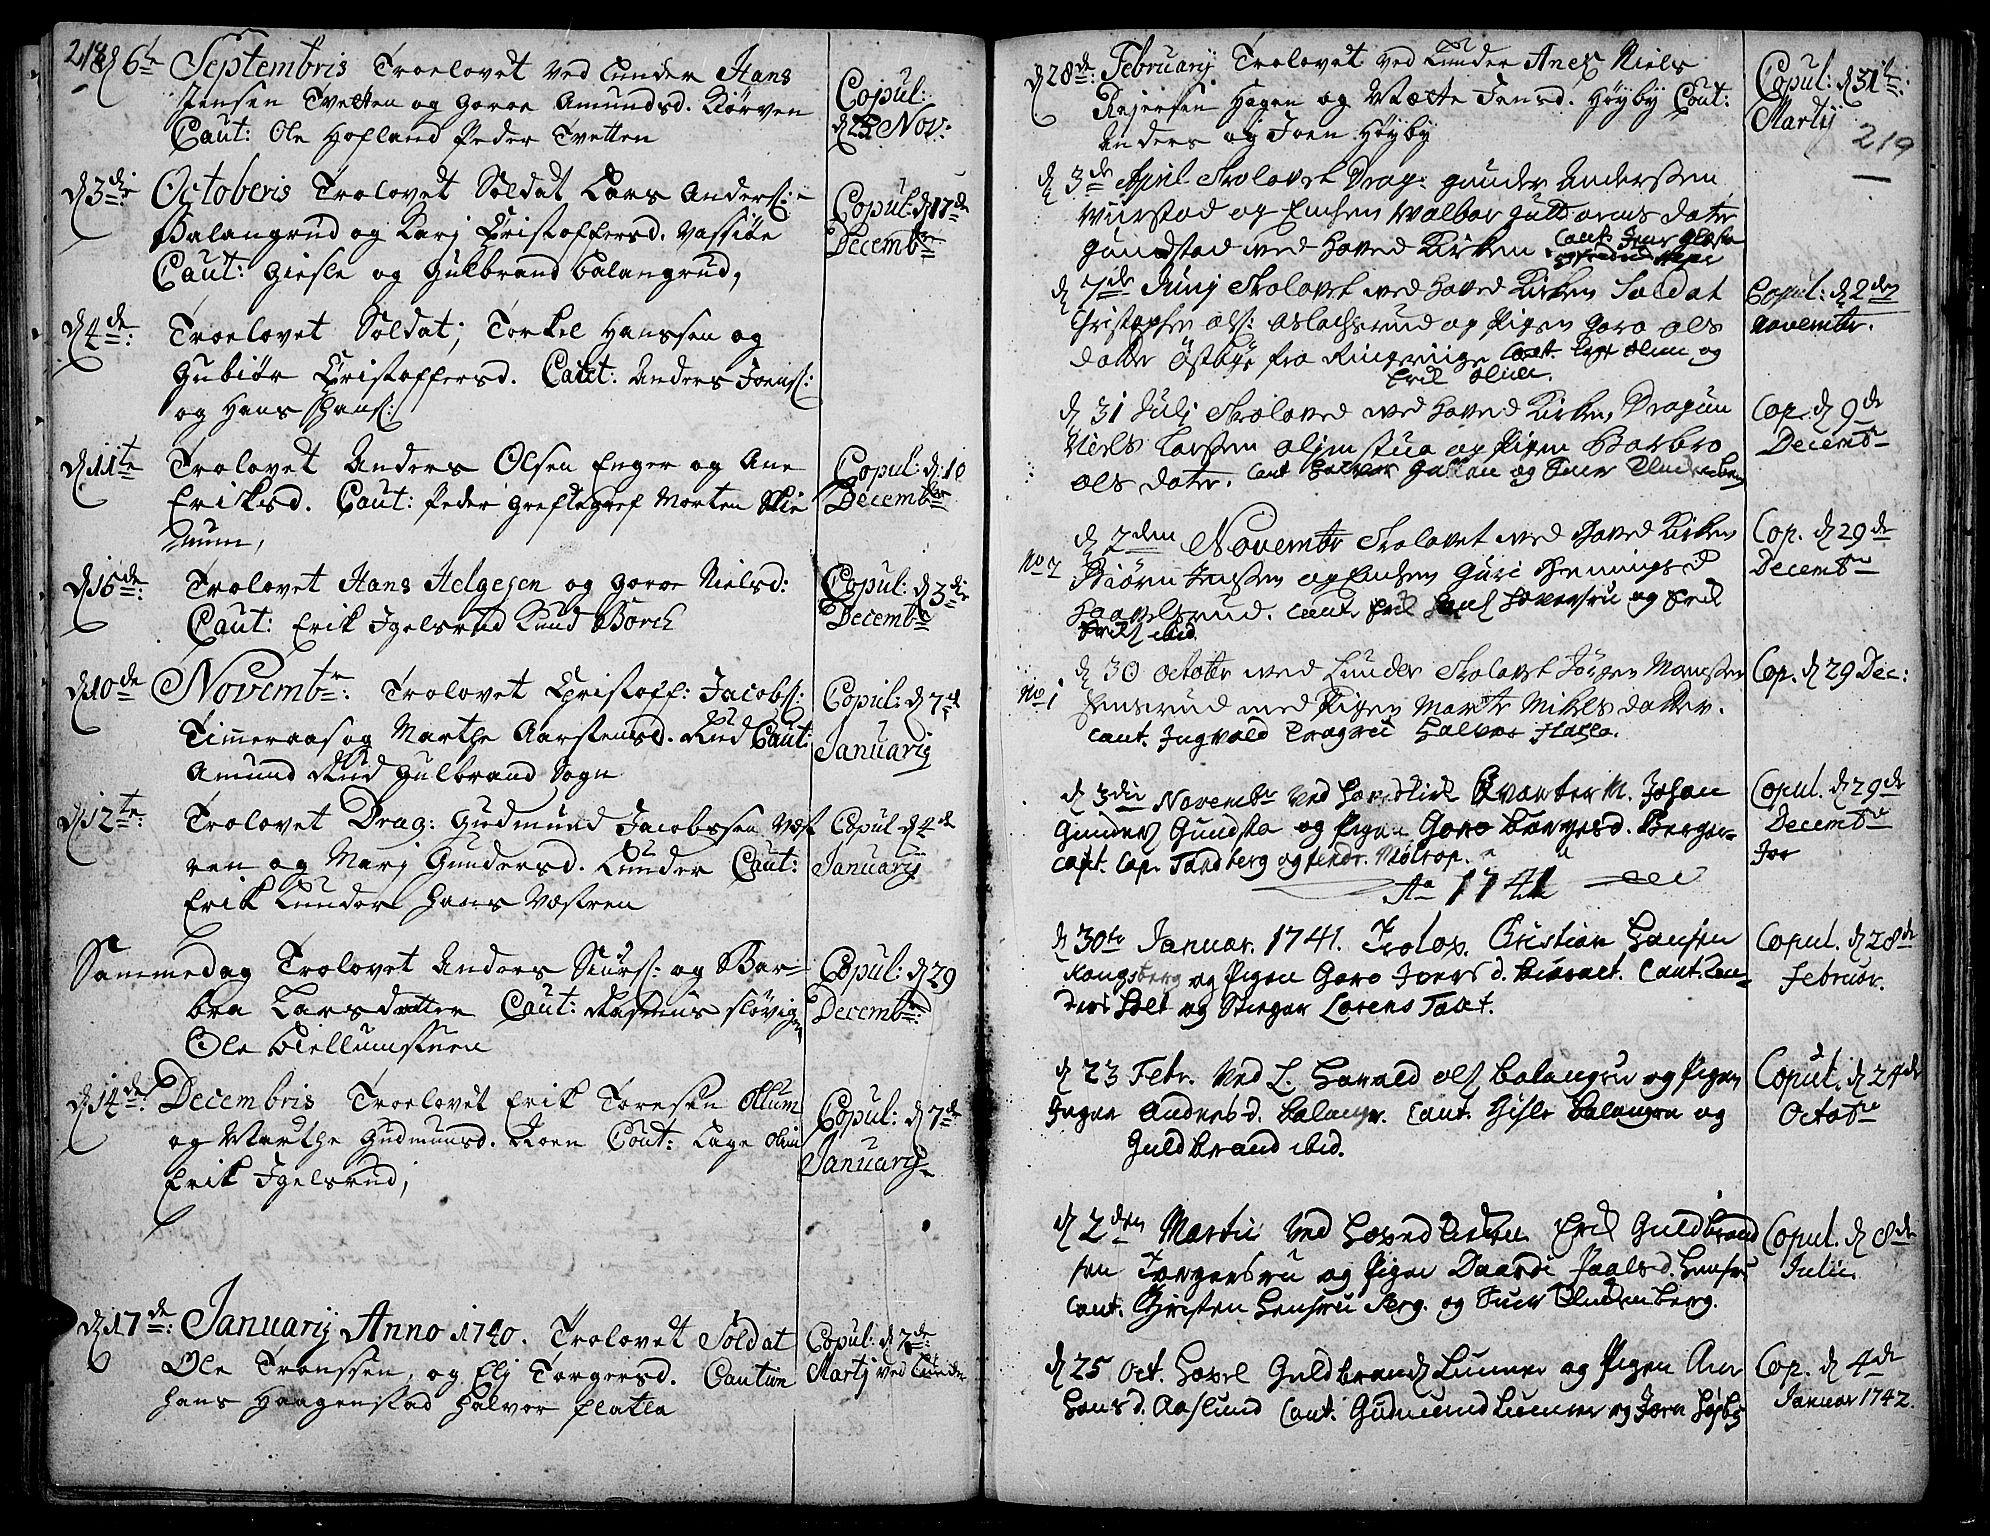 SAH, Jevnaker prestekontor, Ministerialbok nr. 2, 1725-1751, s. 218-219